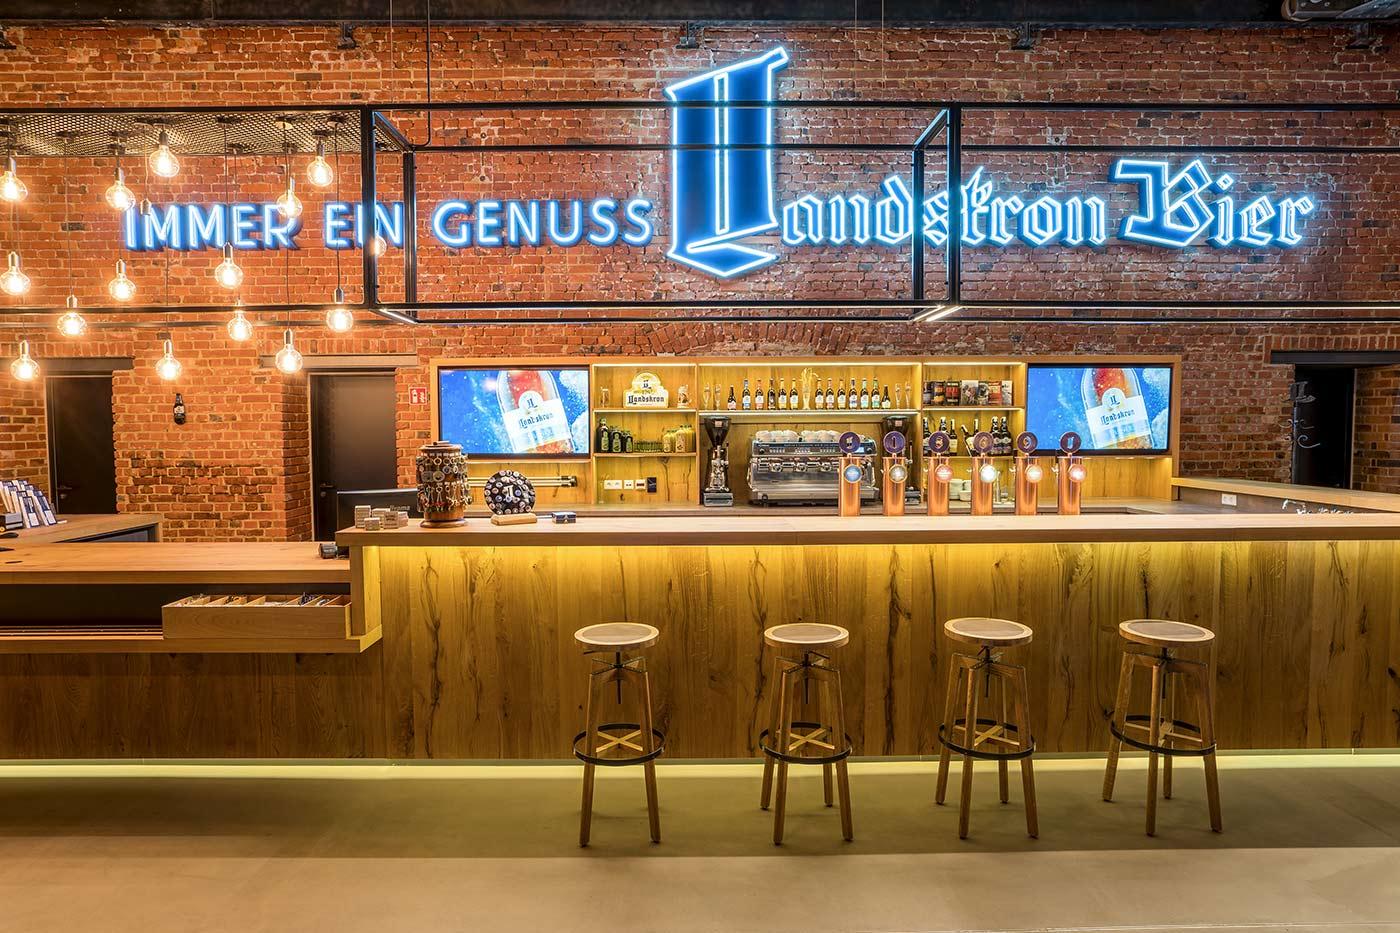 Landskron Brauerei Innen Leda